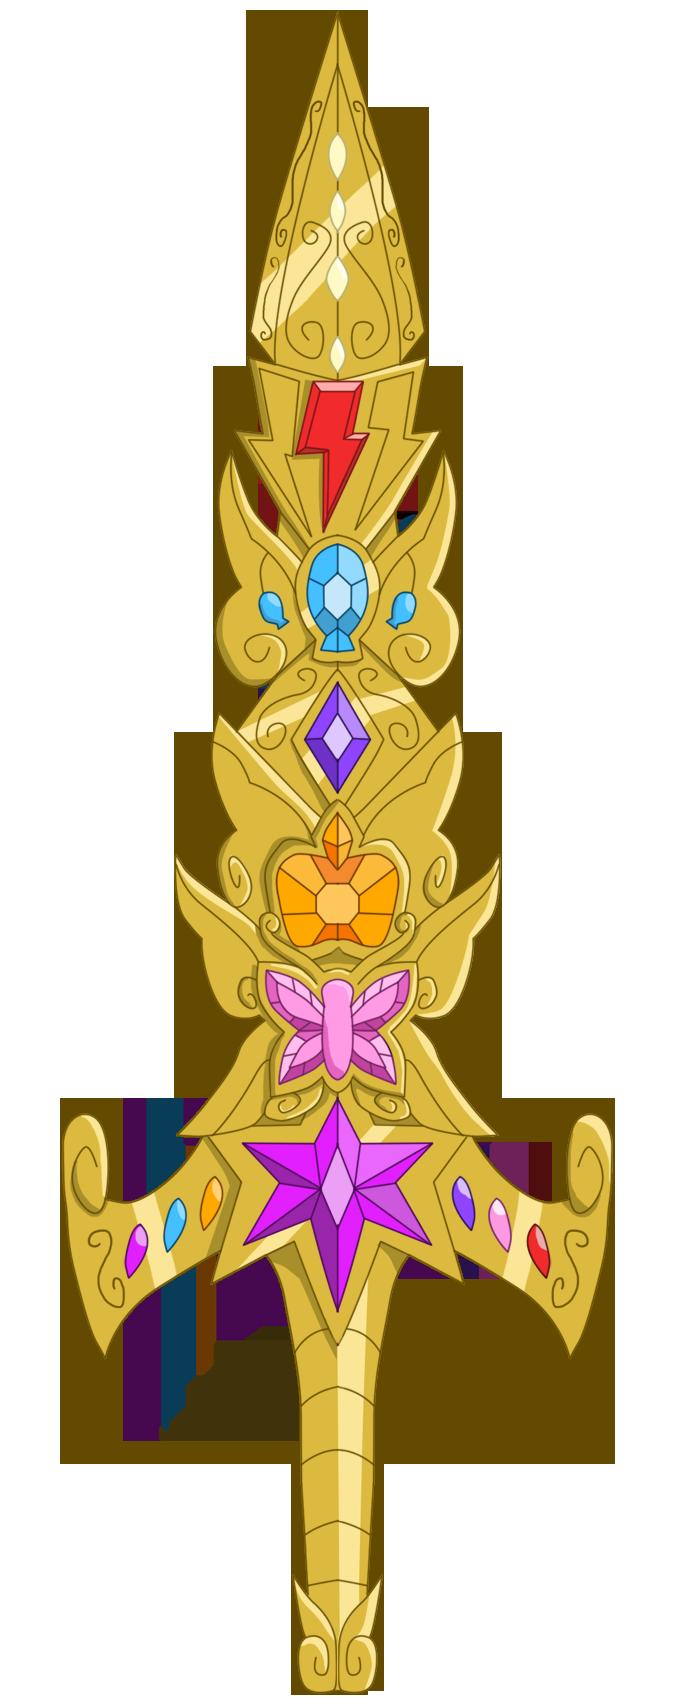 MLP Sword -  MLP Sword  - #cartoonnetwork #miraculous #miraculousladybug #miraculousladybugandcatnoir #miraculousladybugseason4 #miraculousladybugseason4episode1 #mlp #mylittlepony #mylittleponyequestriagirls #Sword